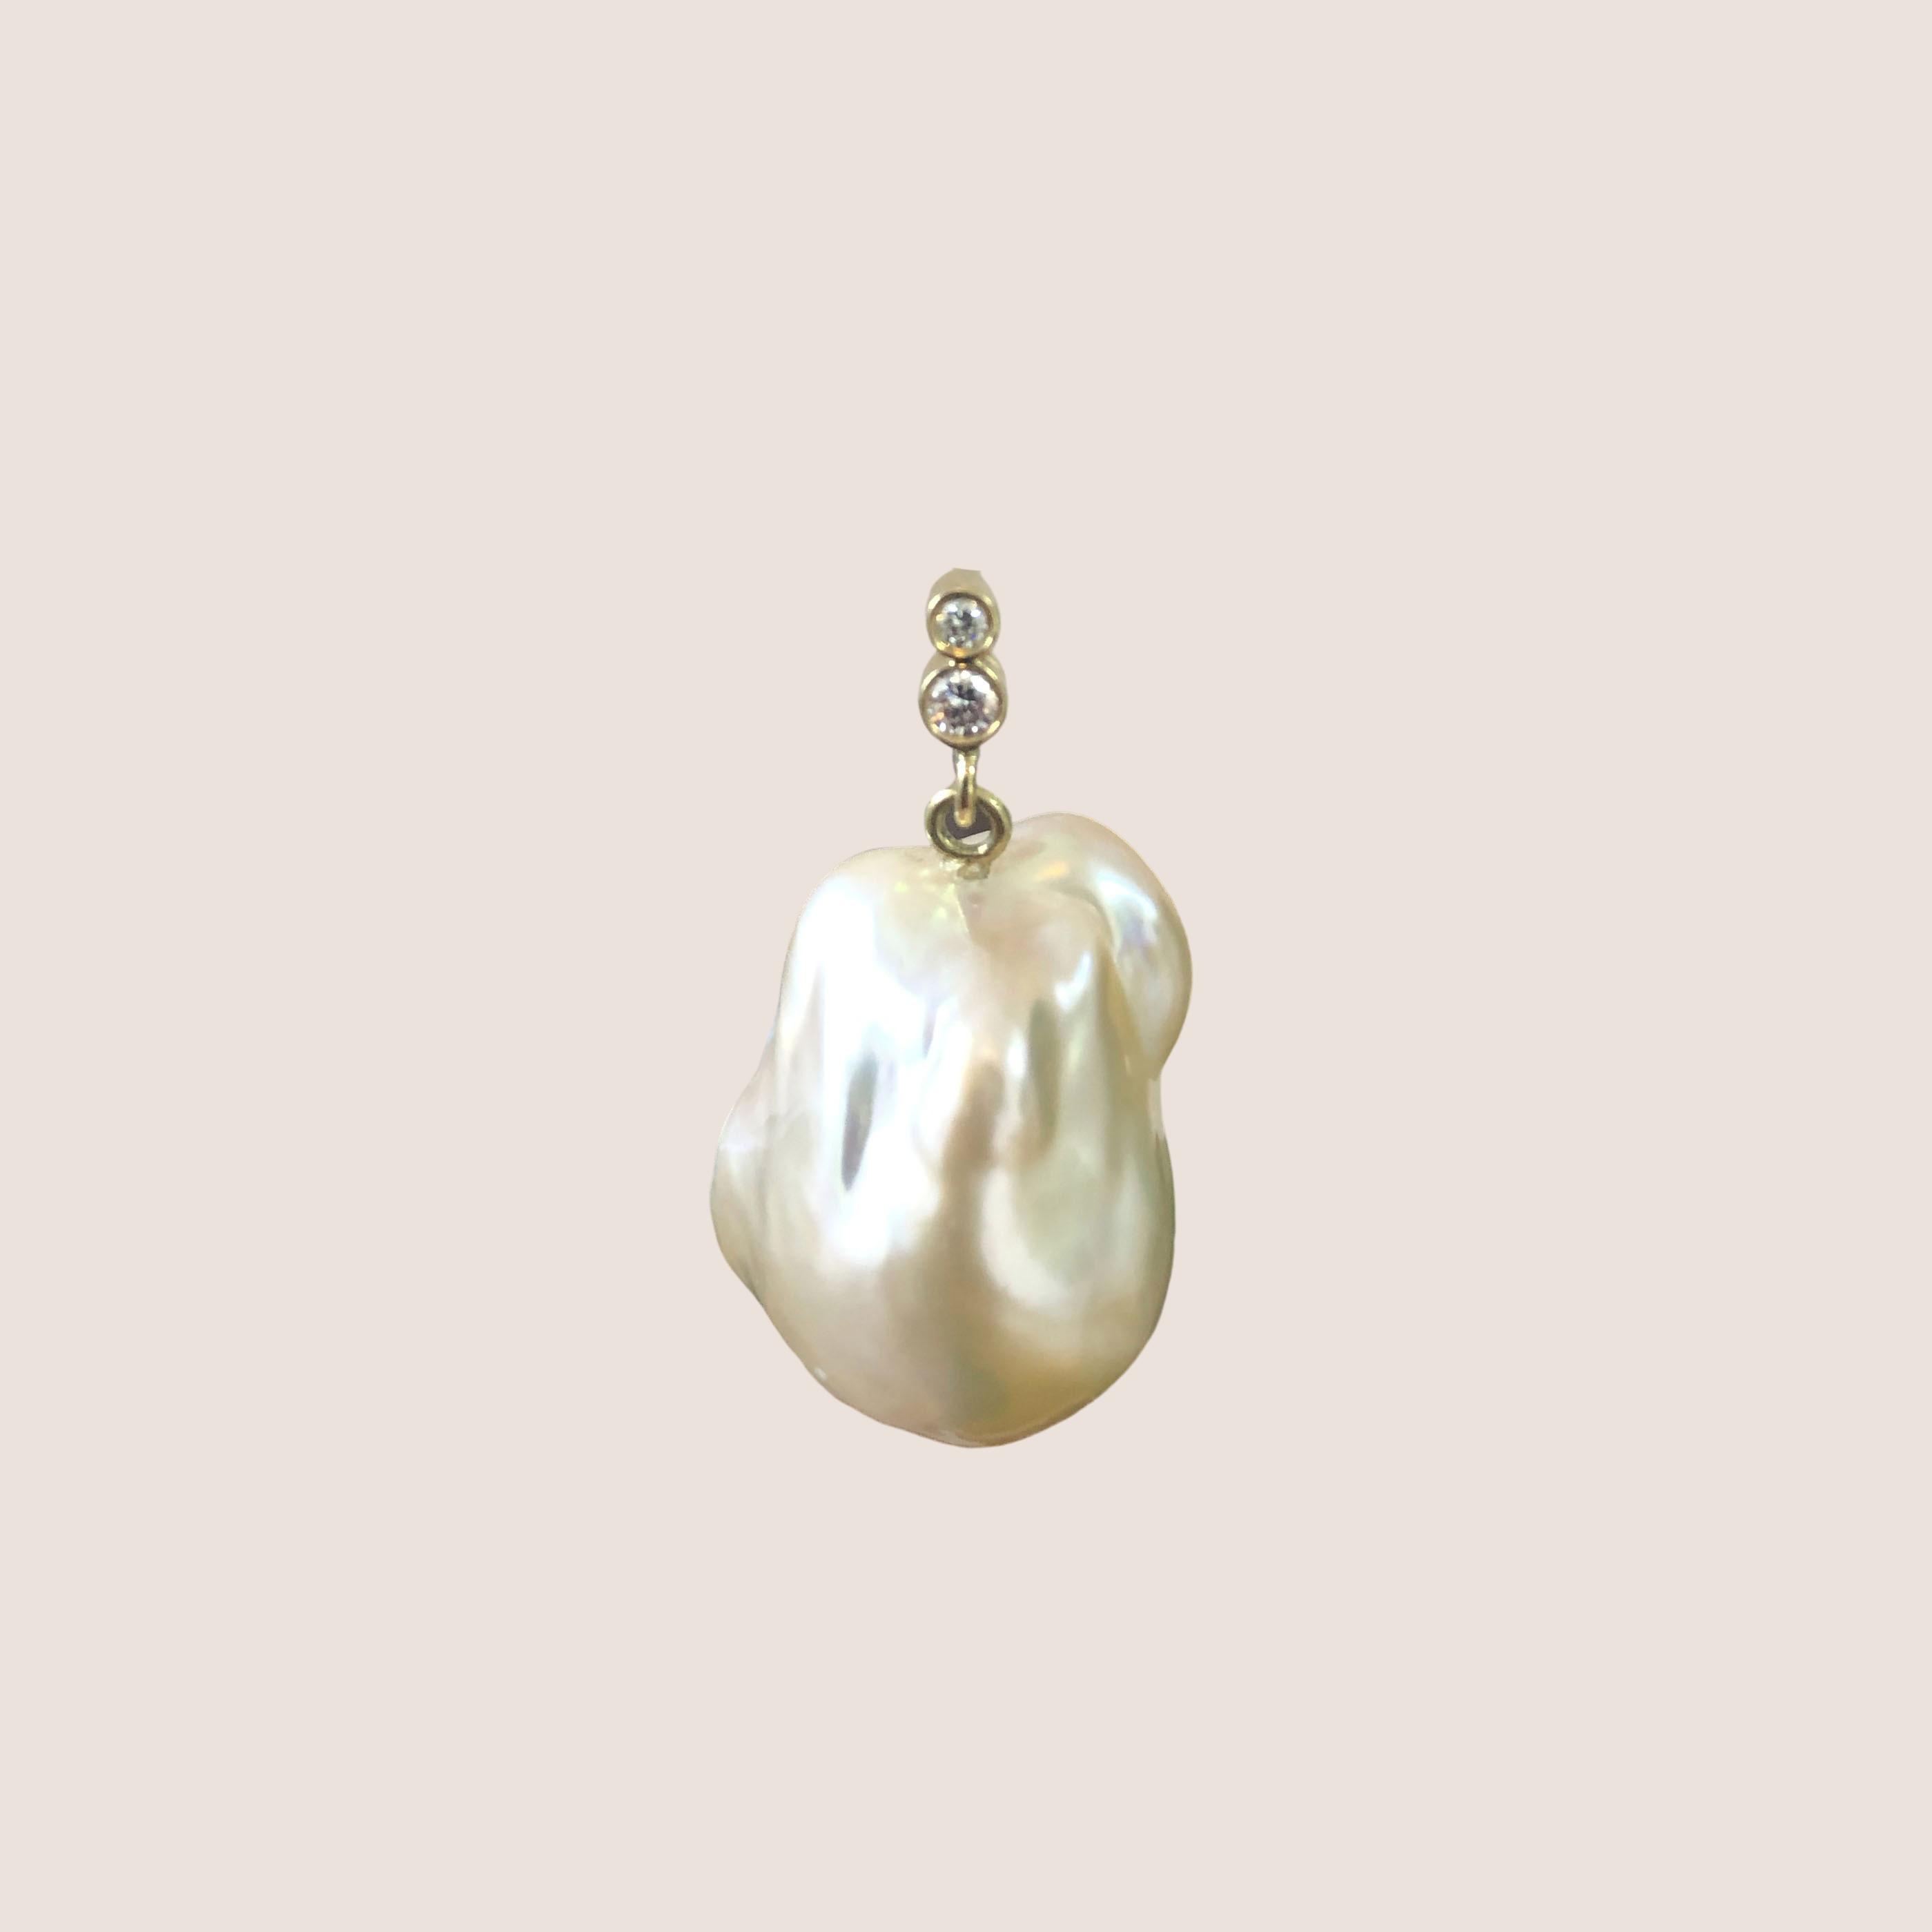 Peachy Baroque Earring